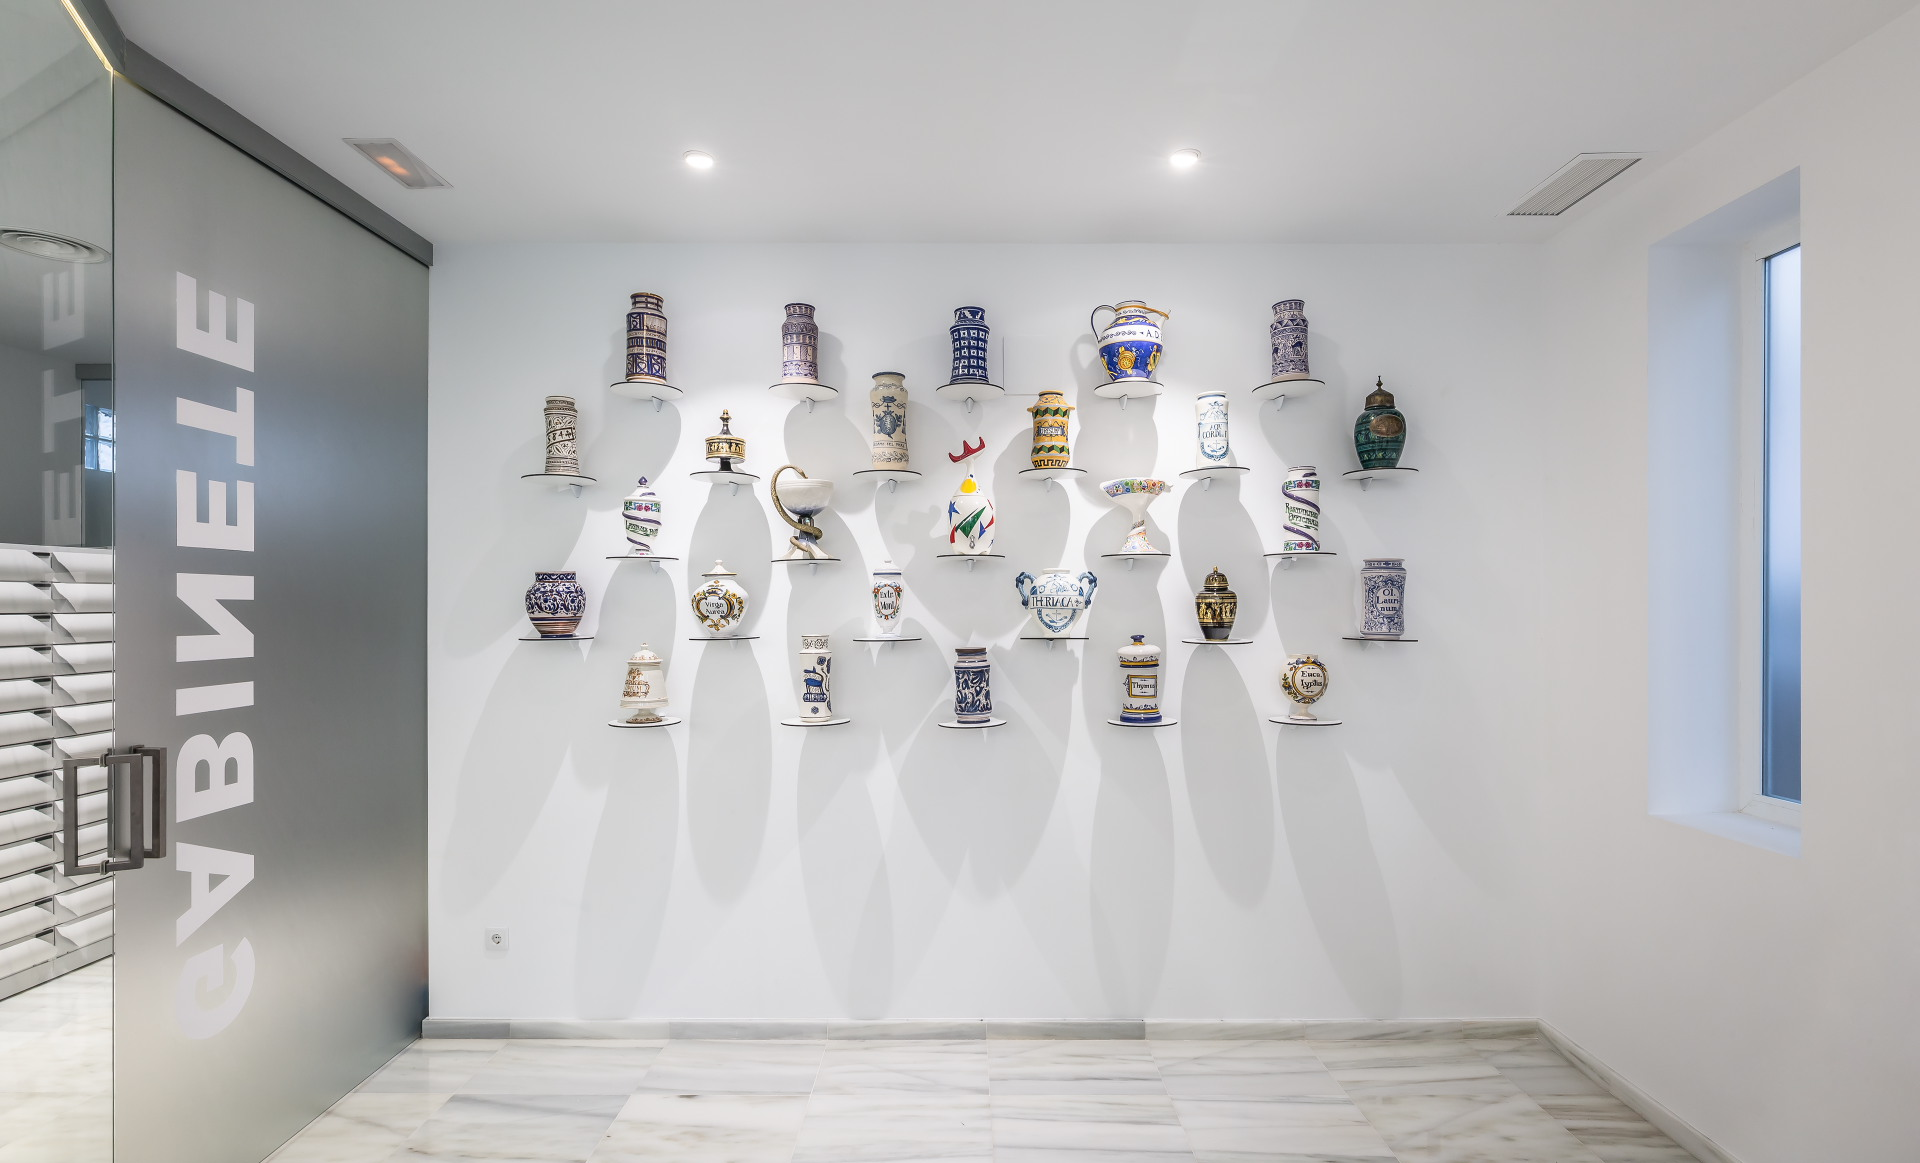 fotografia-arquitectura-valencia-german-cabo-d'estudio-farmacia-sanchis-ribarroja (22)